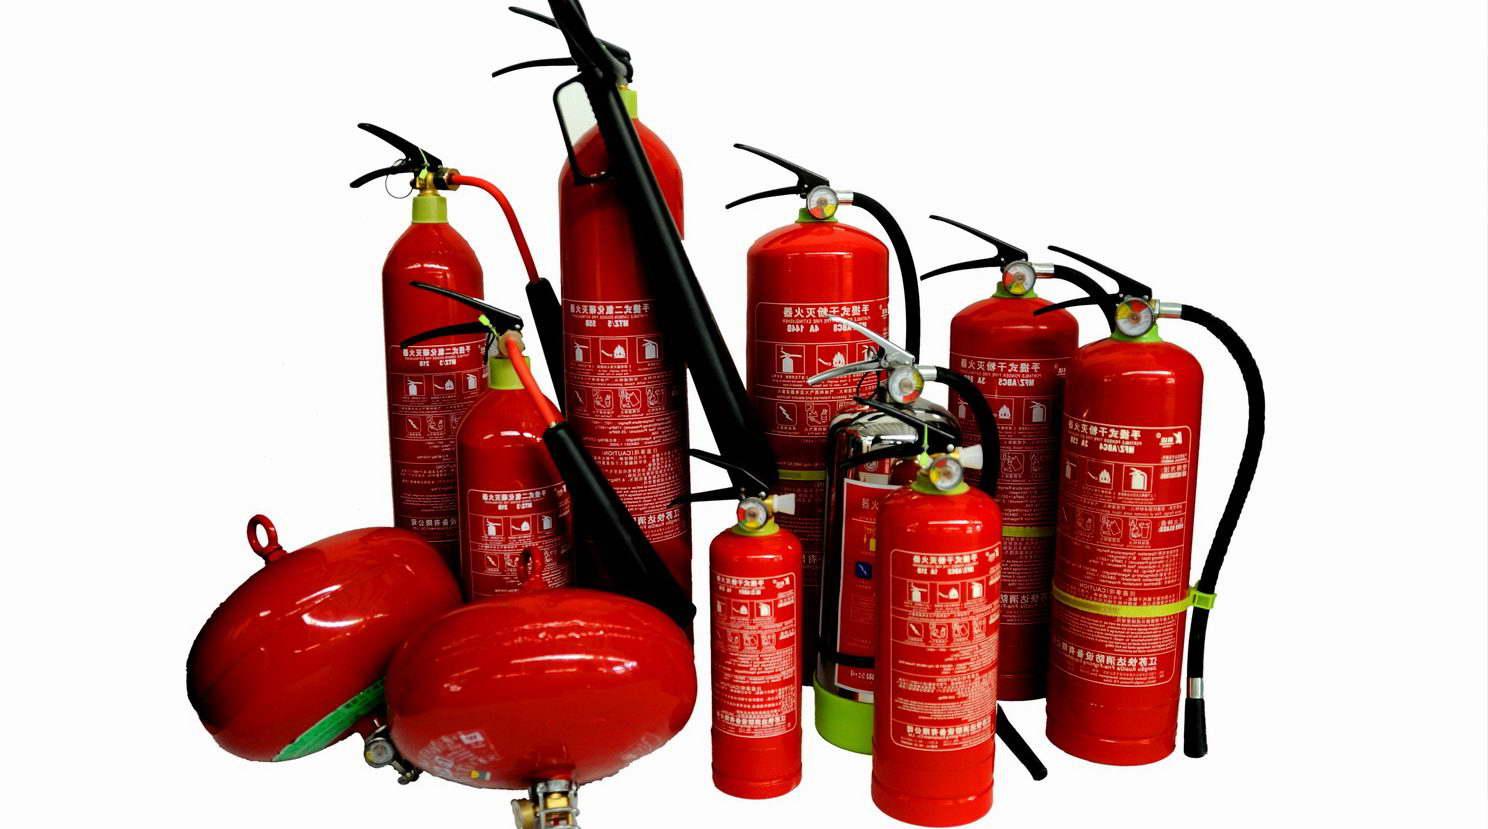 Классификации огнетушителей